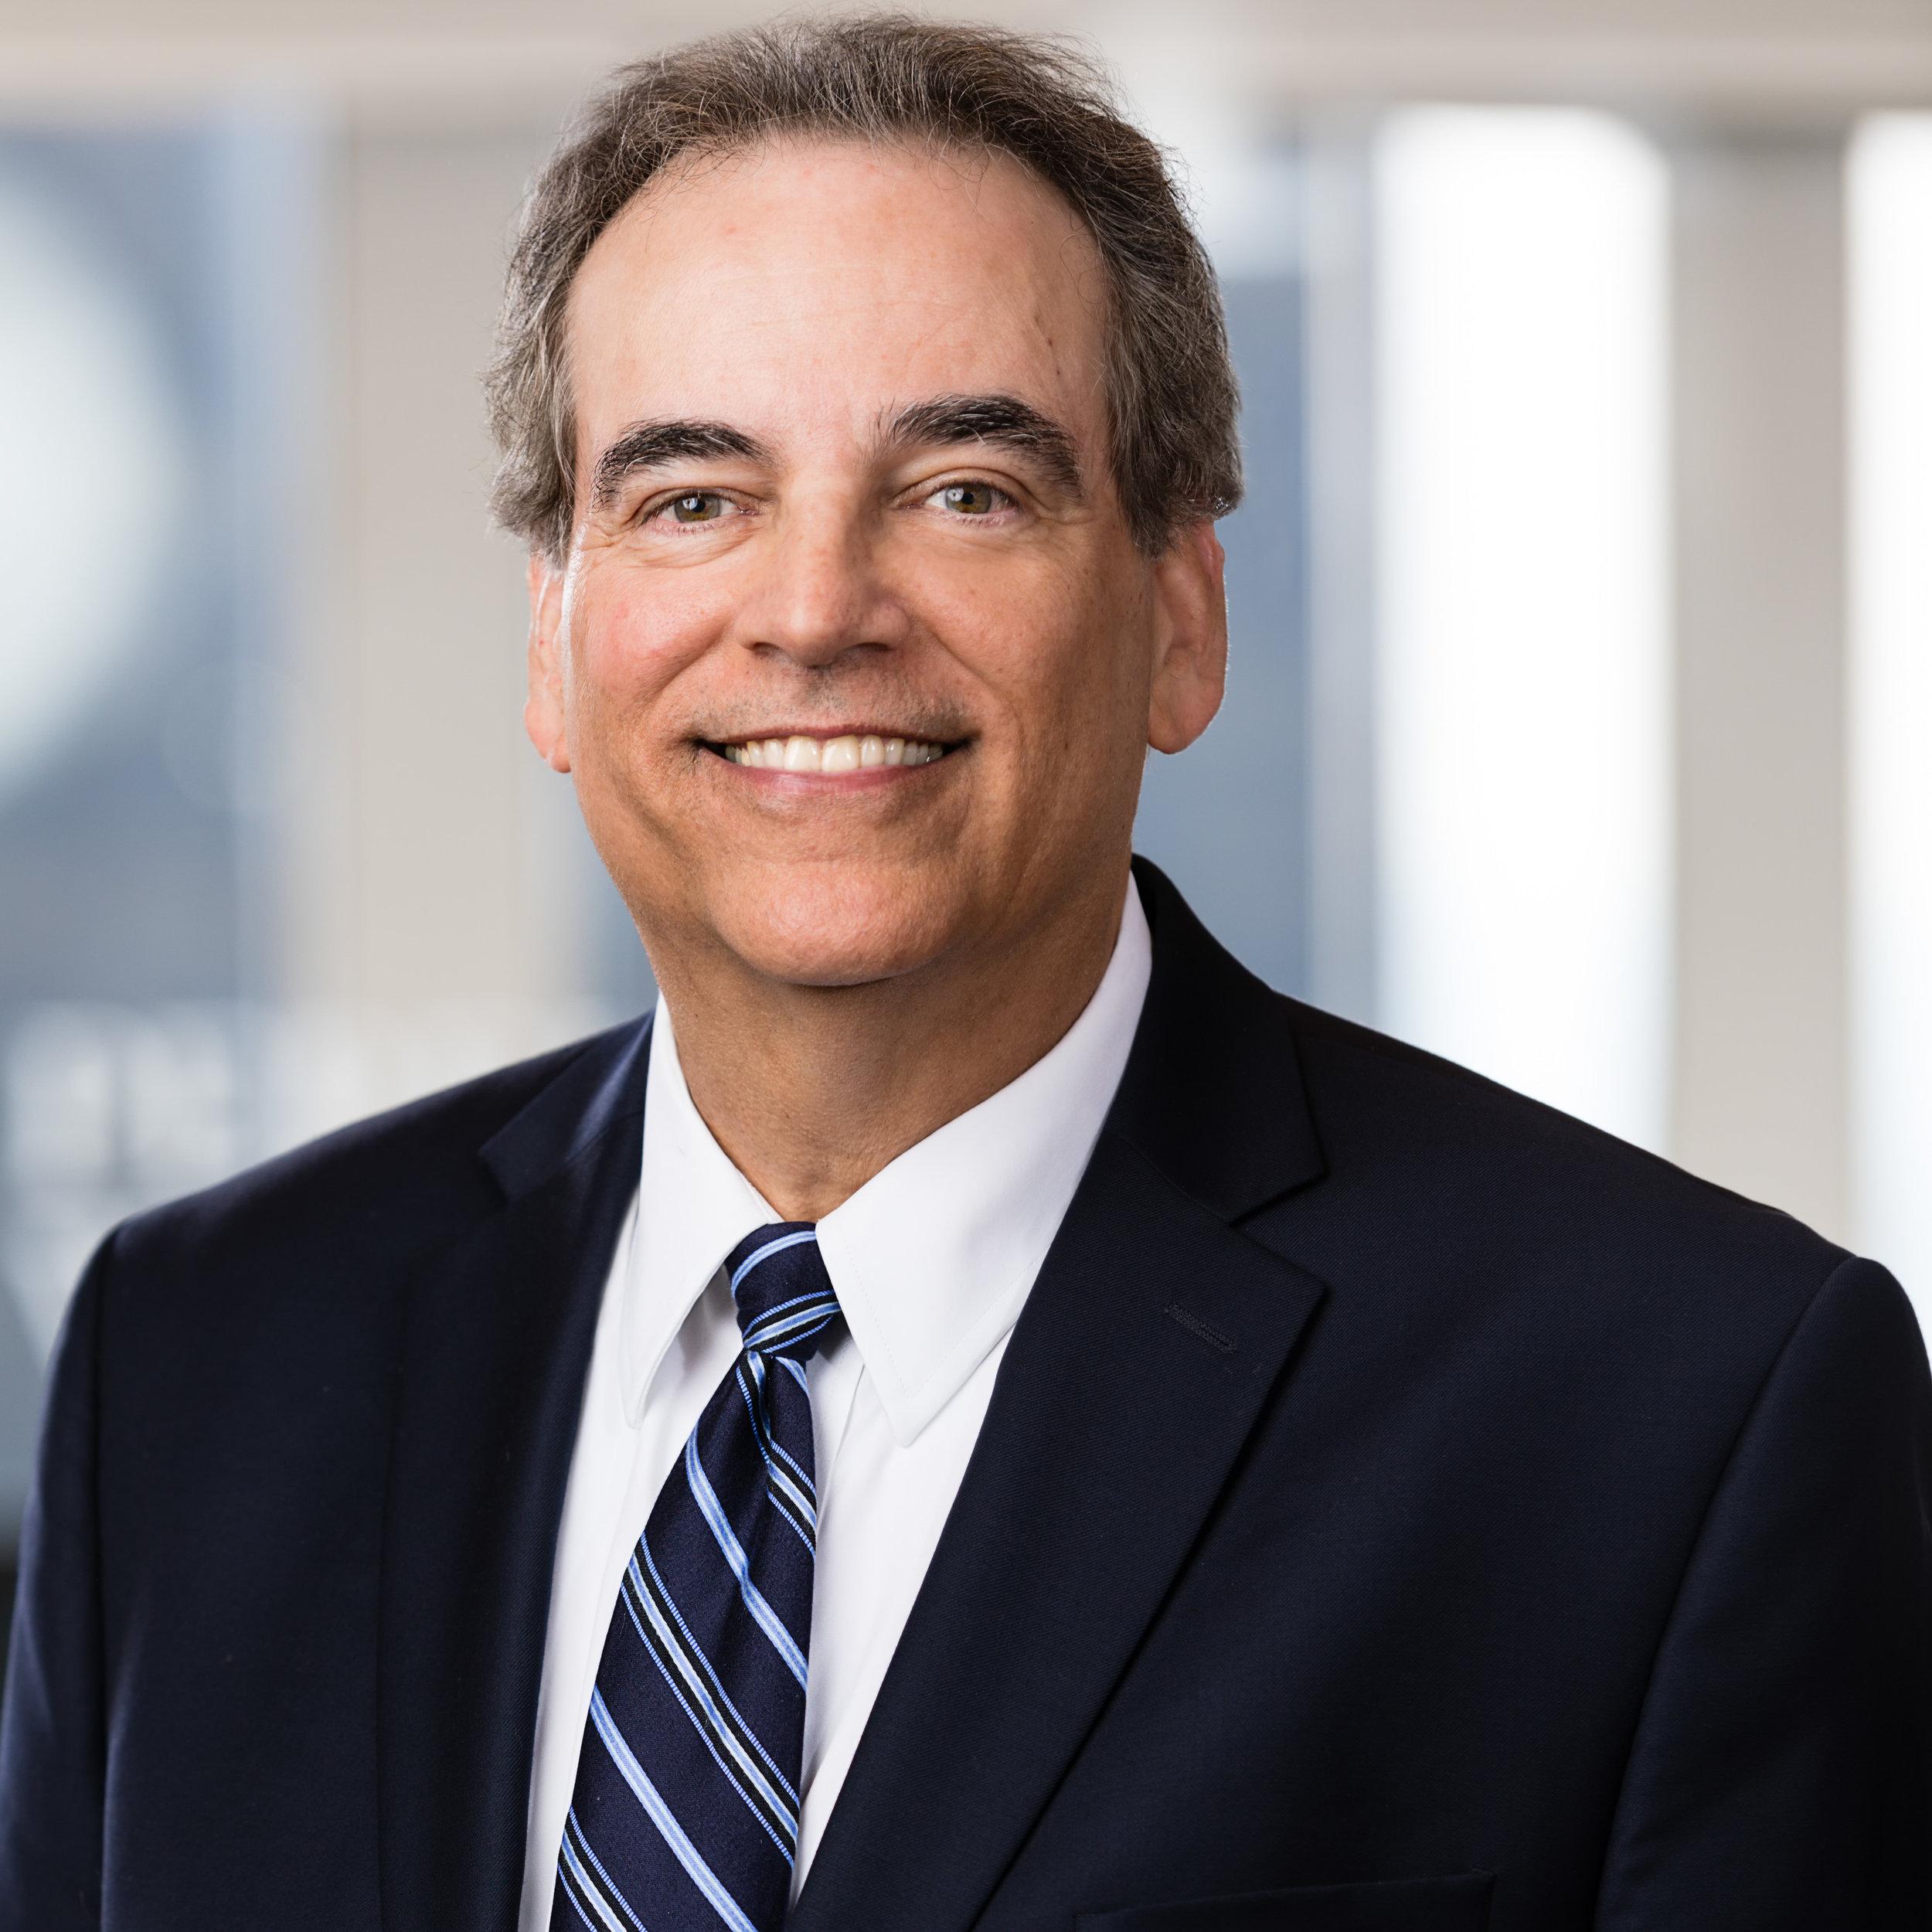 Bruce Levinson, CPA, MBA, CFP, PFS - PARTNER212-605-3117blevinson@pwcpa.comDOWNLOAD V-CARD ⬇